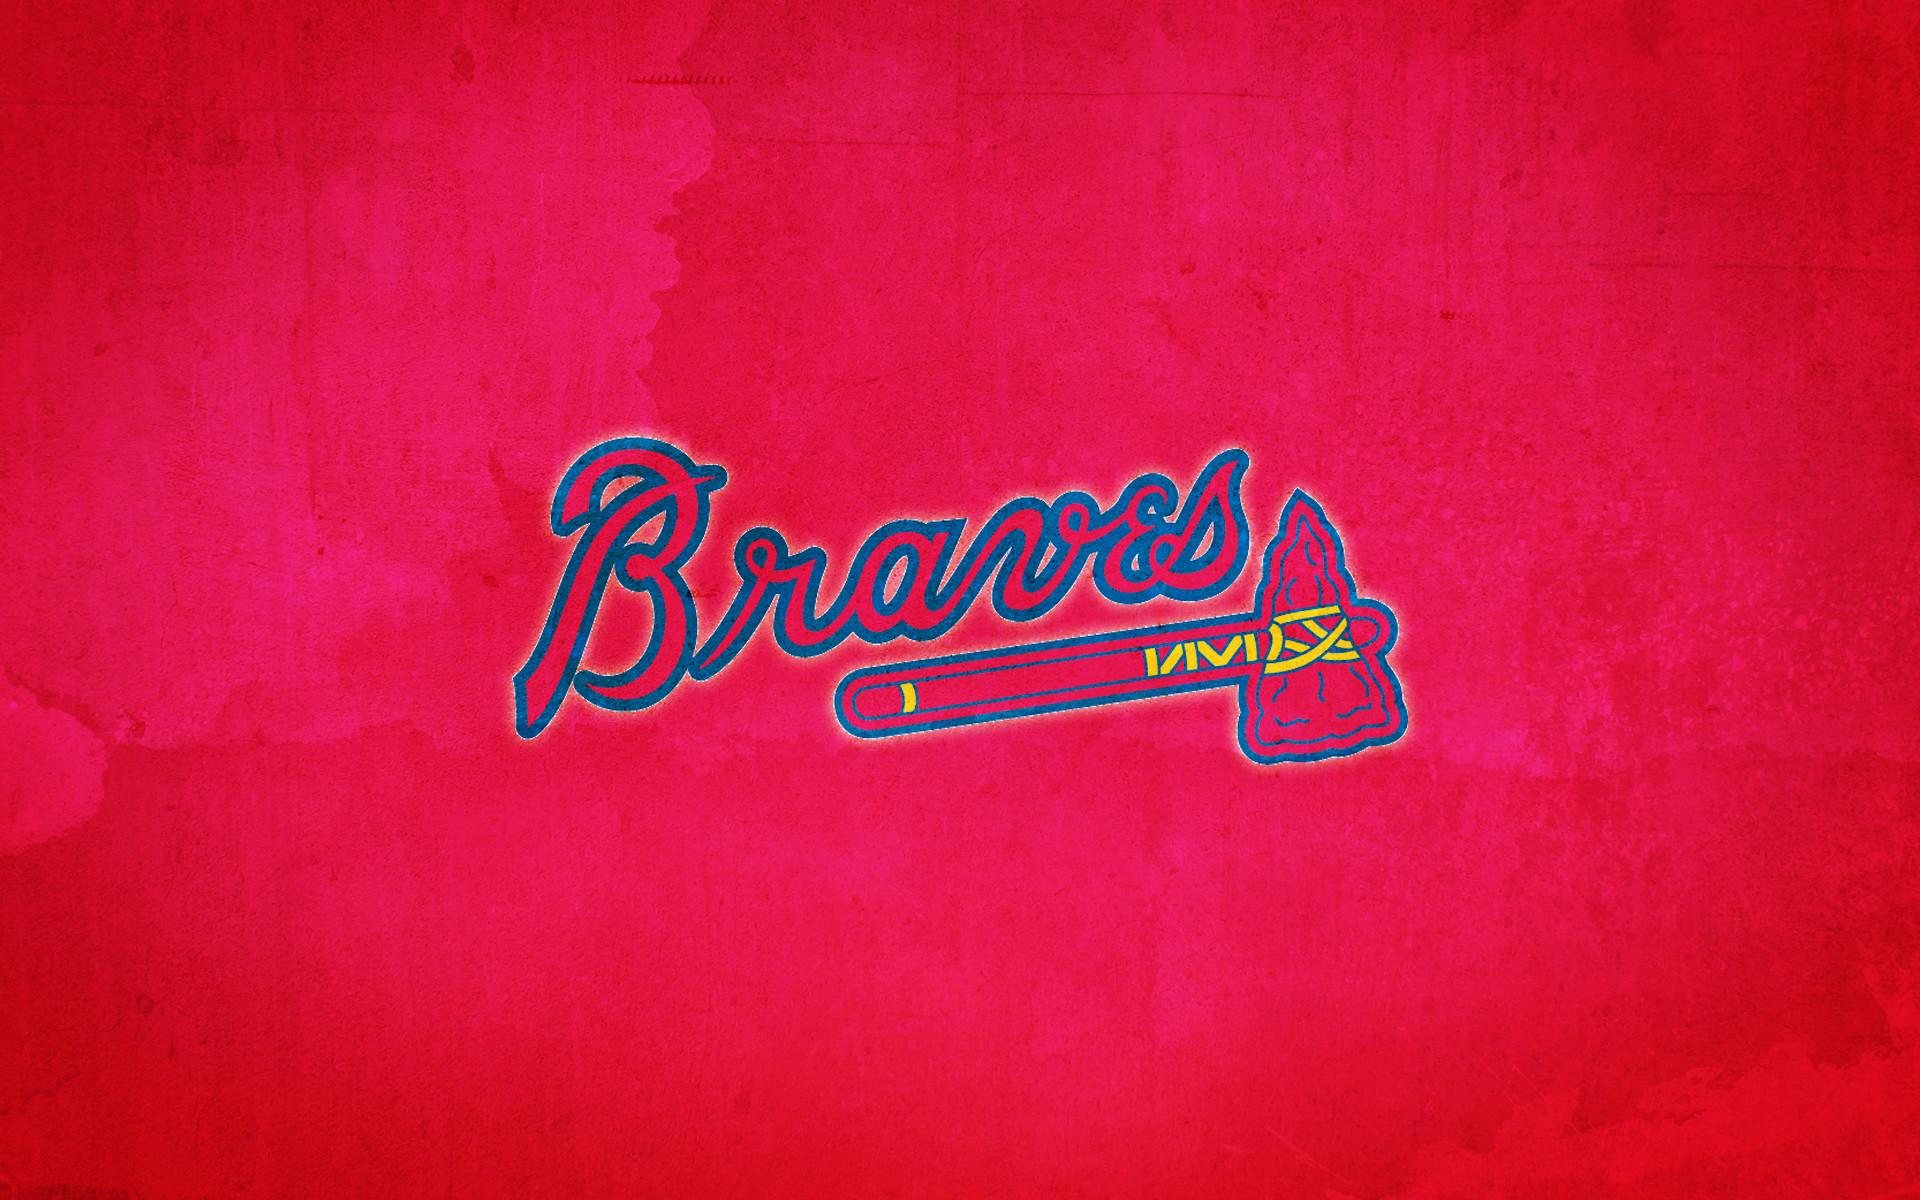 Atlanta Braves Wallpapers (62+ Images